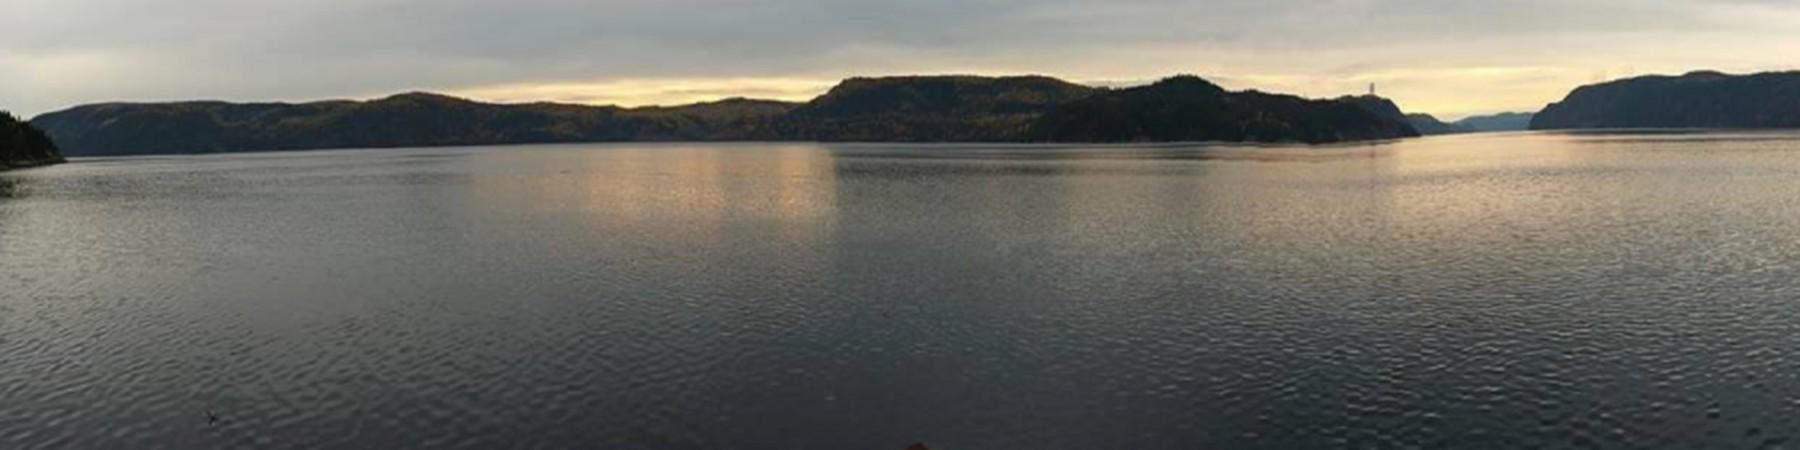 ?u=https%3A%2F%2Fwikitravel.org%2Fupload%2Fshared%2F3%2F3e%2FWikitravel_Saguenay-Lac-Saint-Jean_Banner.jpg&f=1&nofb=1